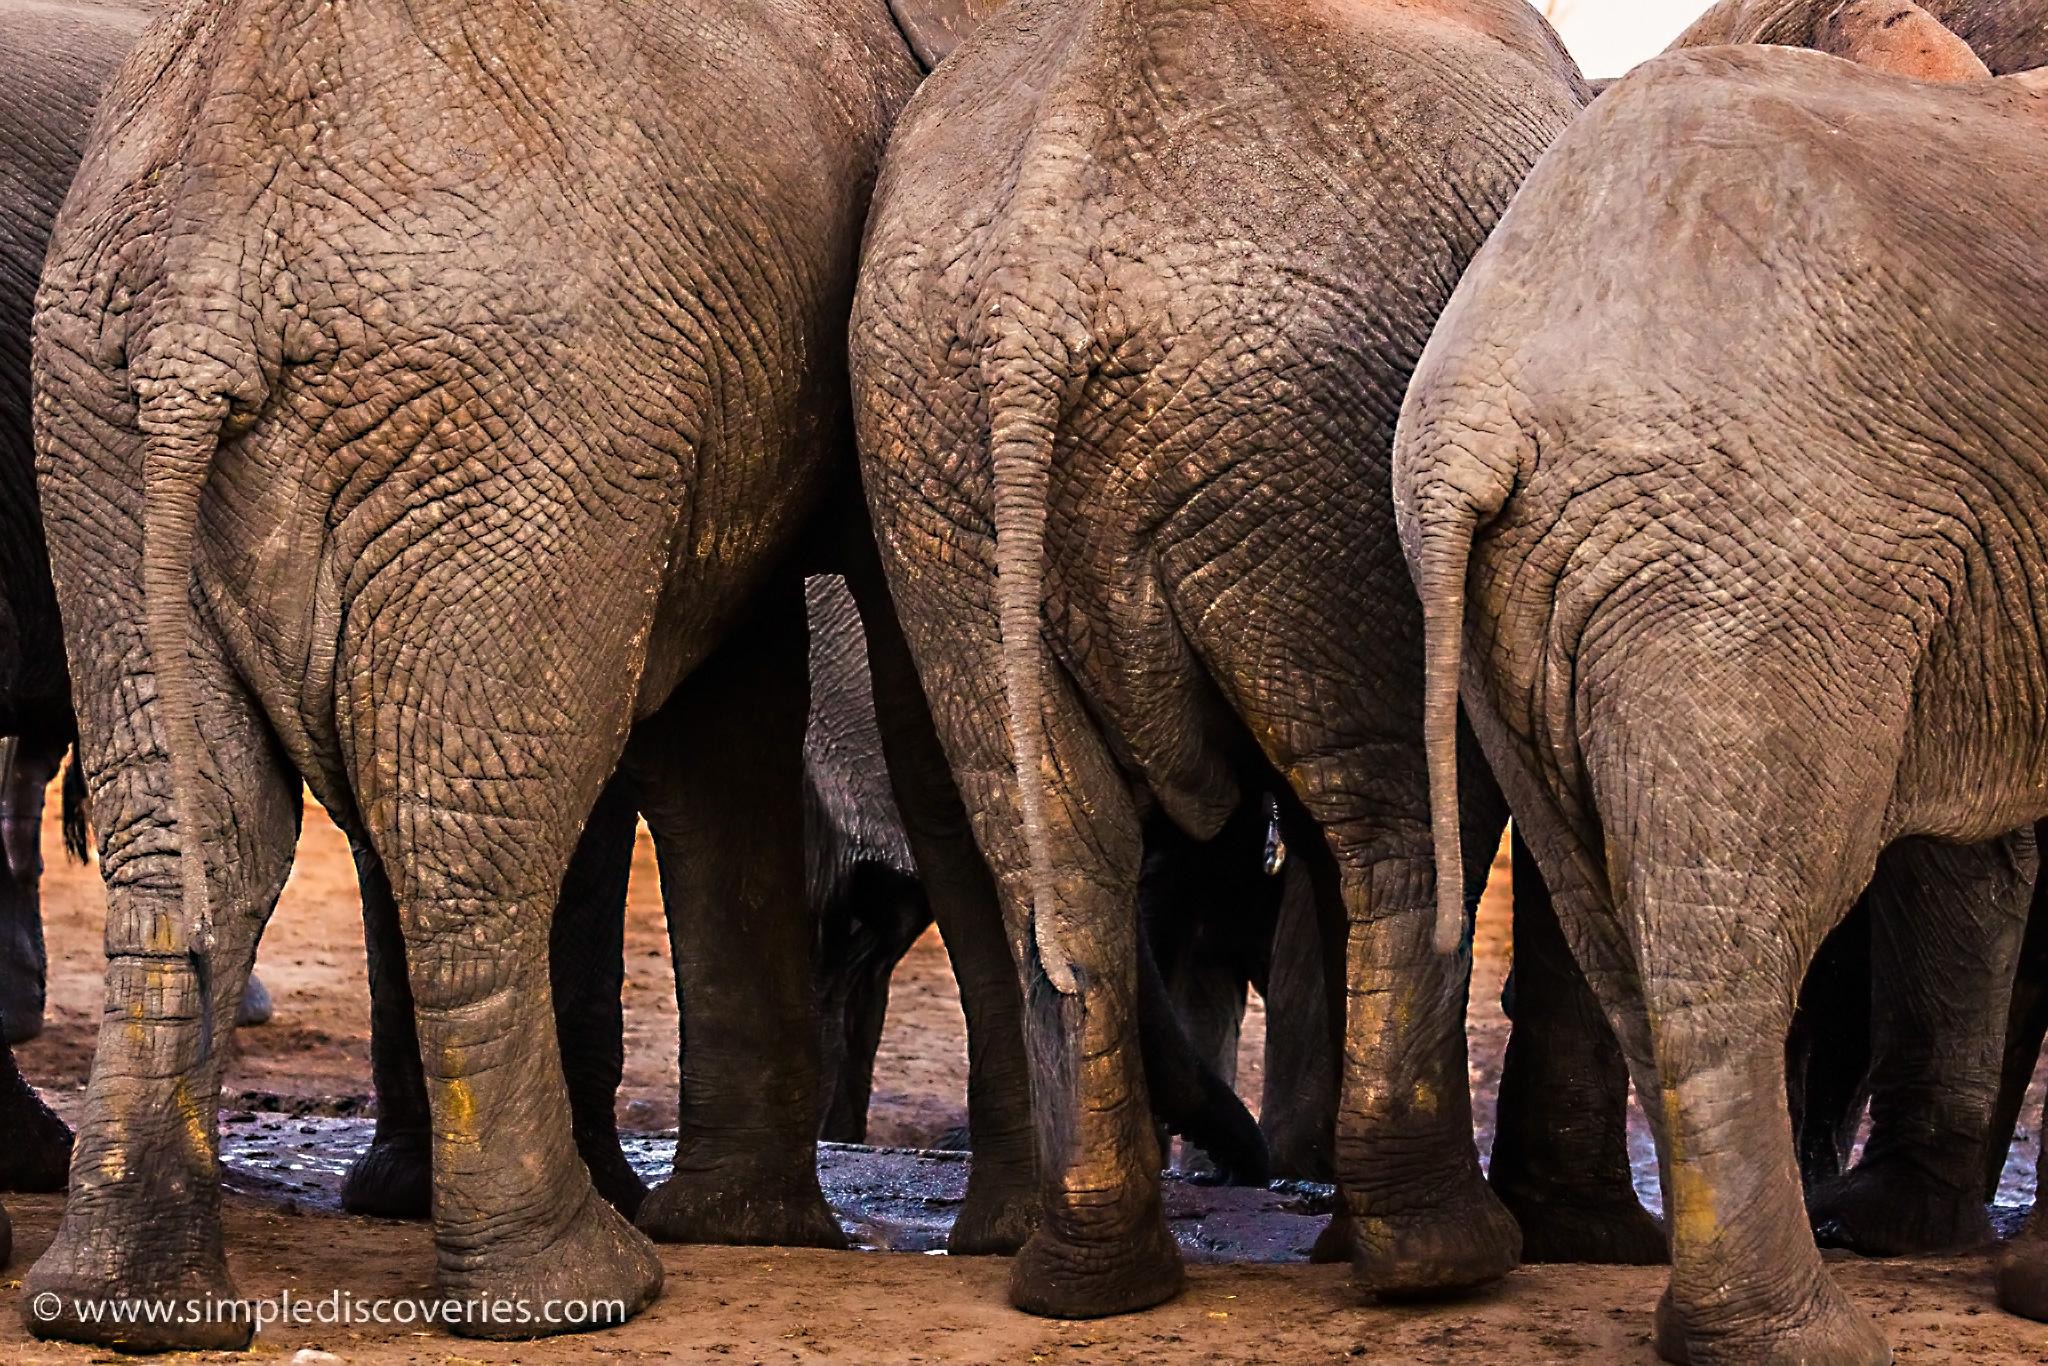 elephant_butts